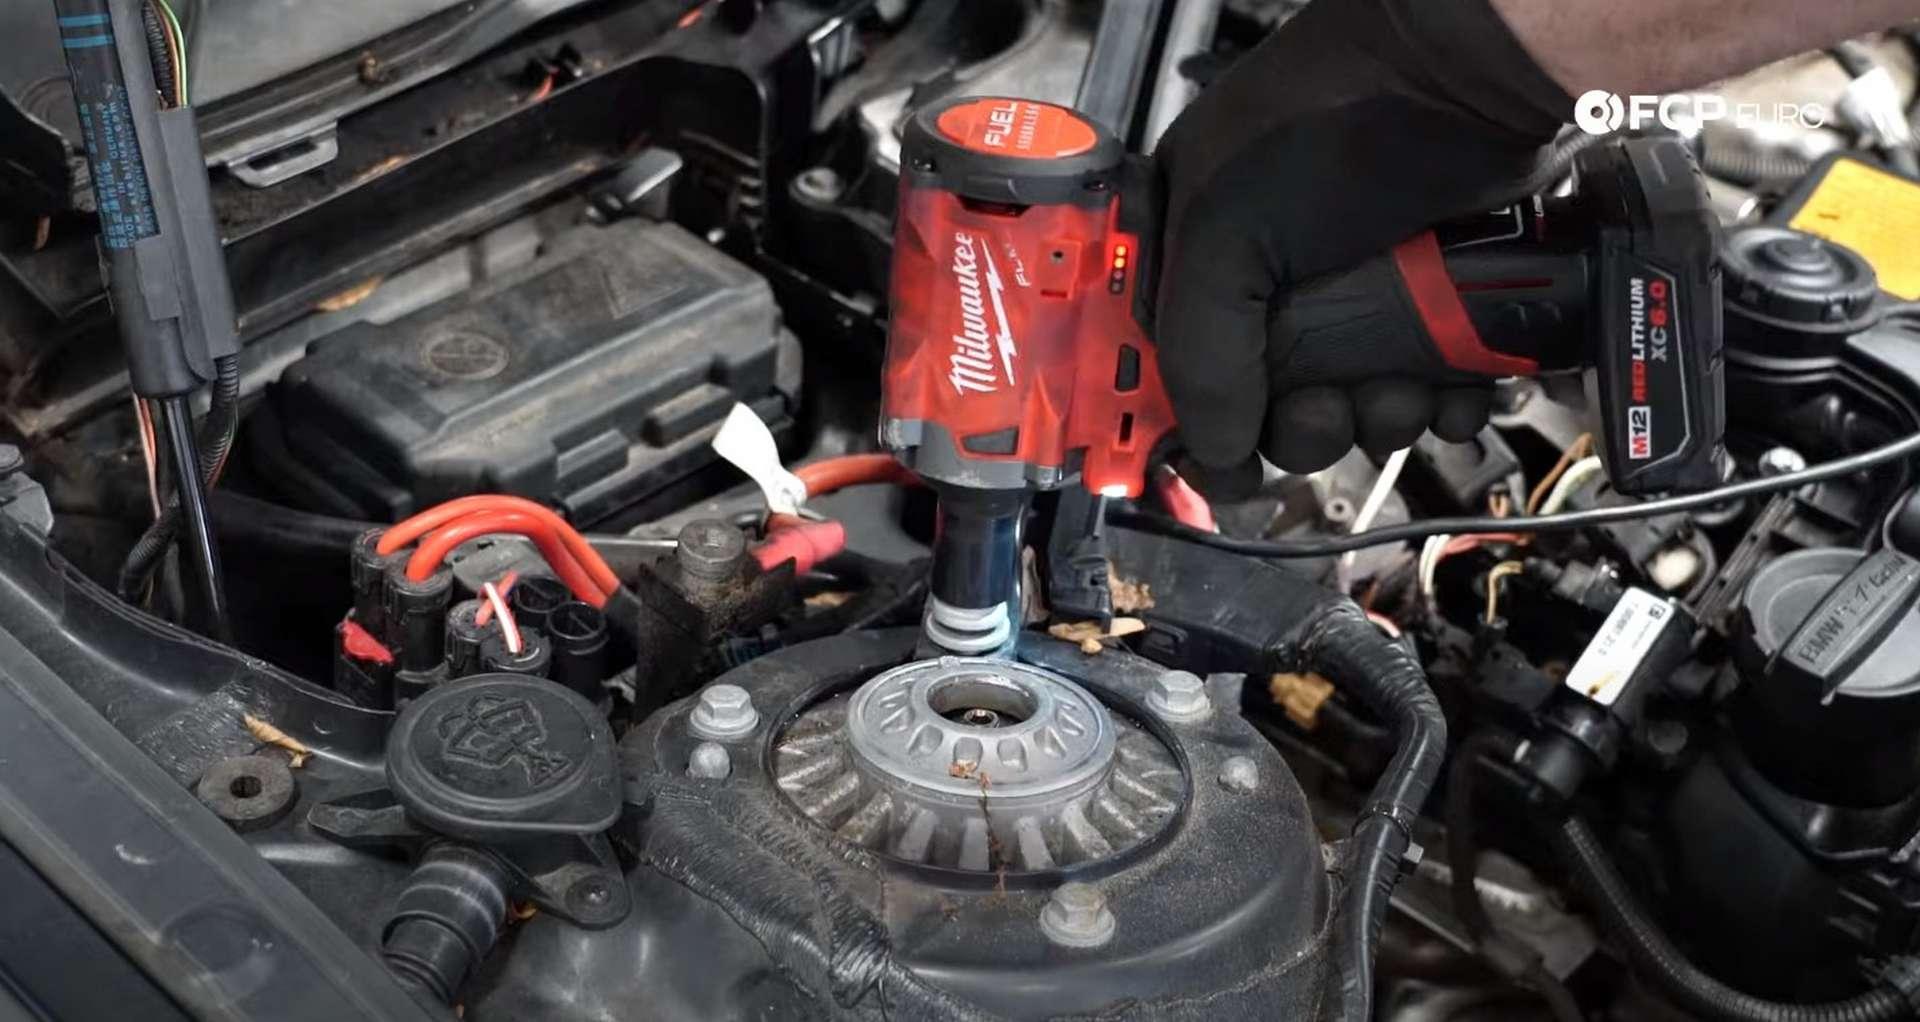 DIY BMW F30 High-Pressure Fuel Pump Replacement removing the strut brace